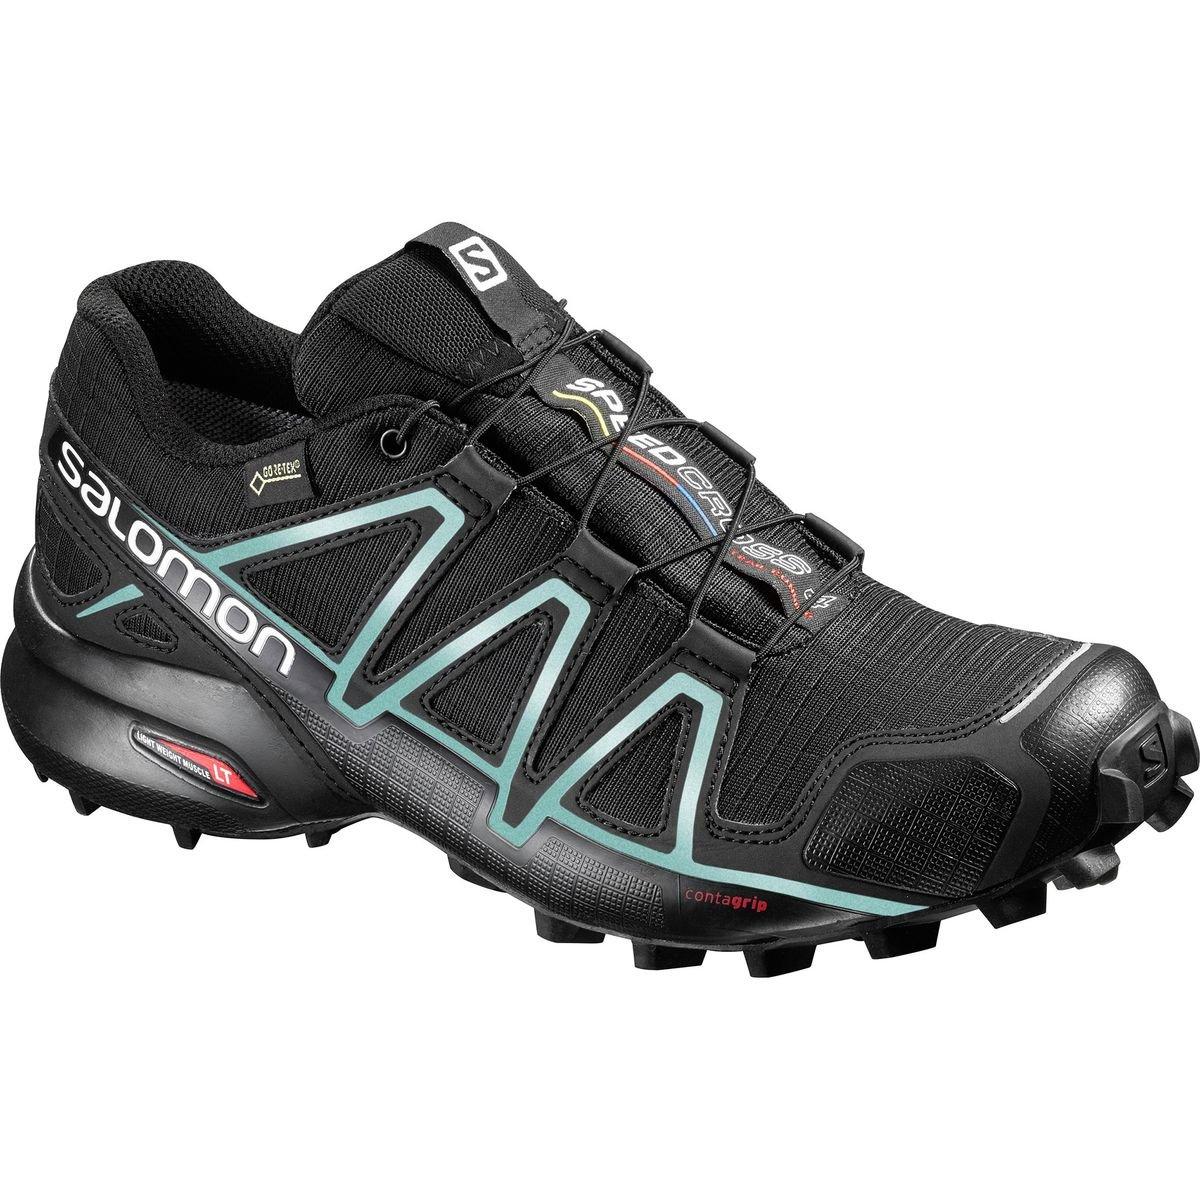 SALOMON Women's Speedcross 4 GTX Trail Running Shoes, Black/Black/Metallic Bubble Blue, 8 by SALOMON